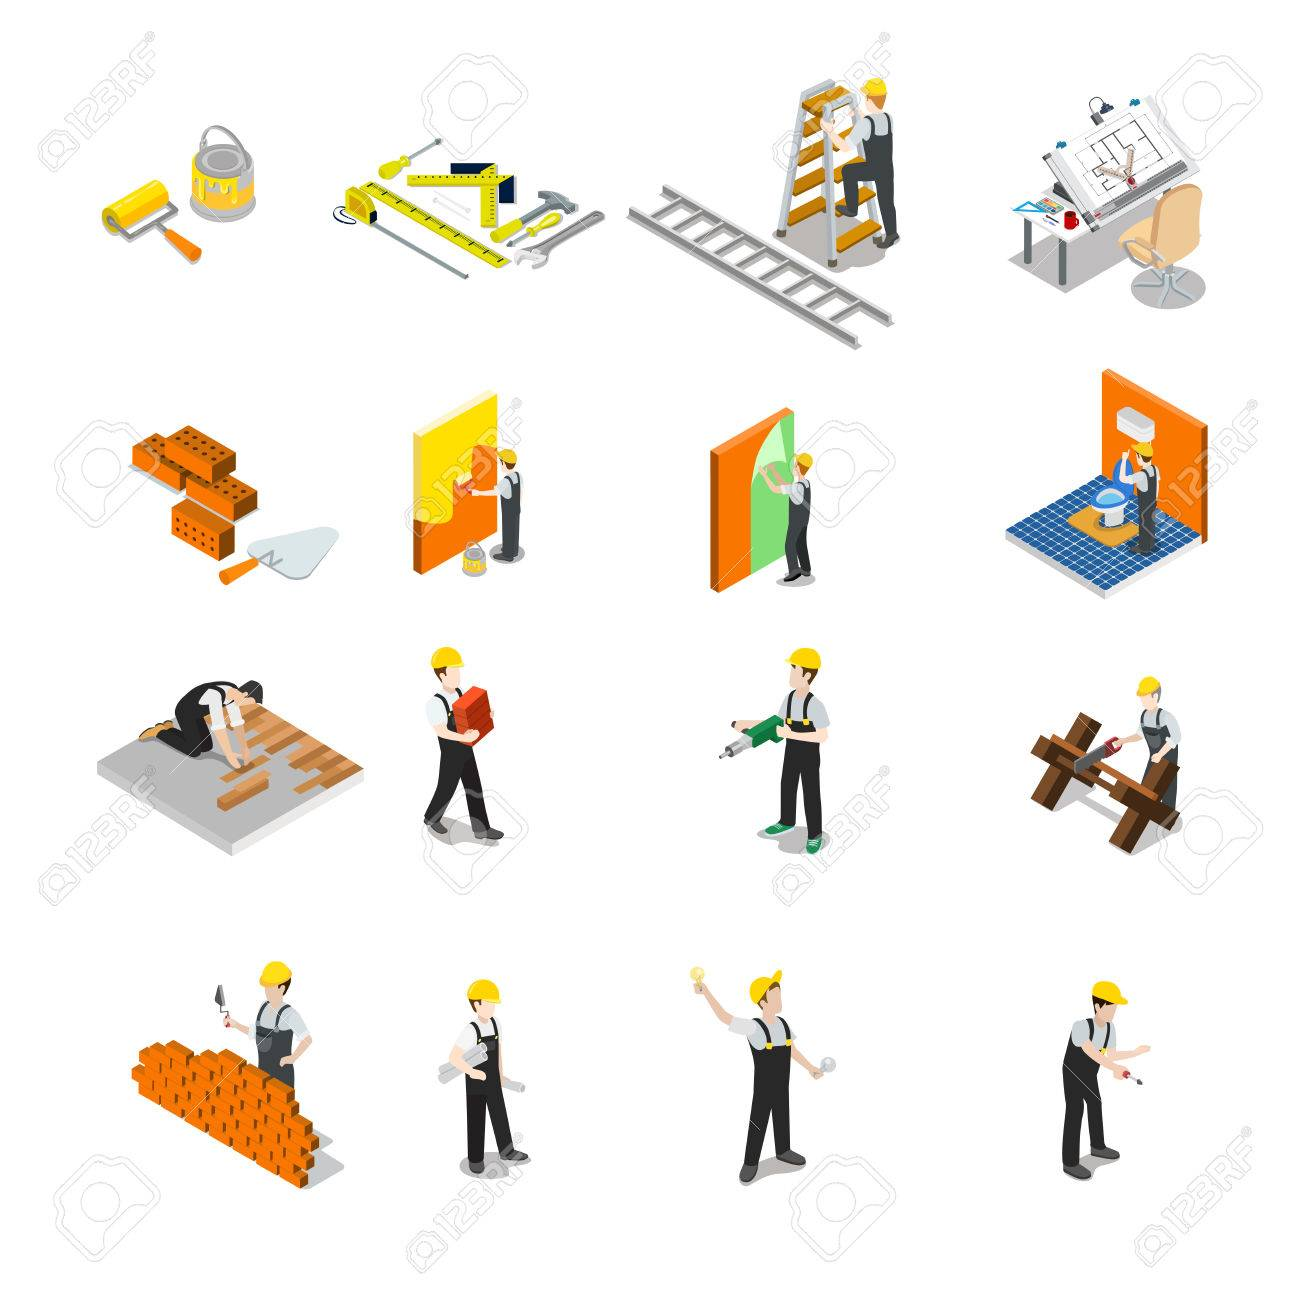 Flat isometric Construction professional icons. - 75850081